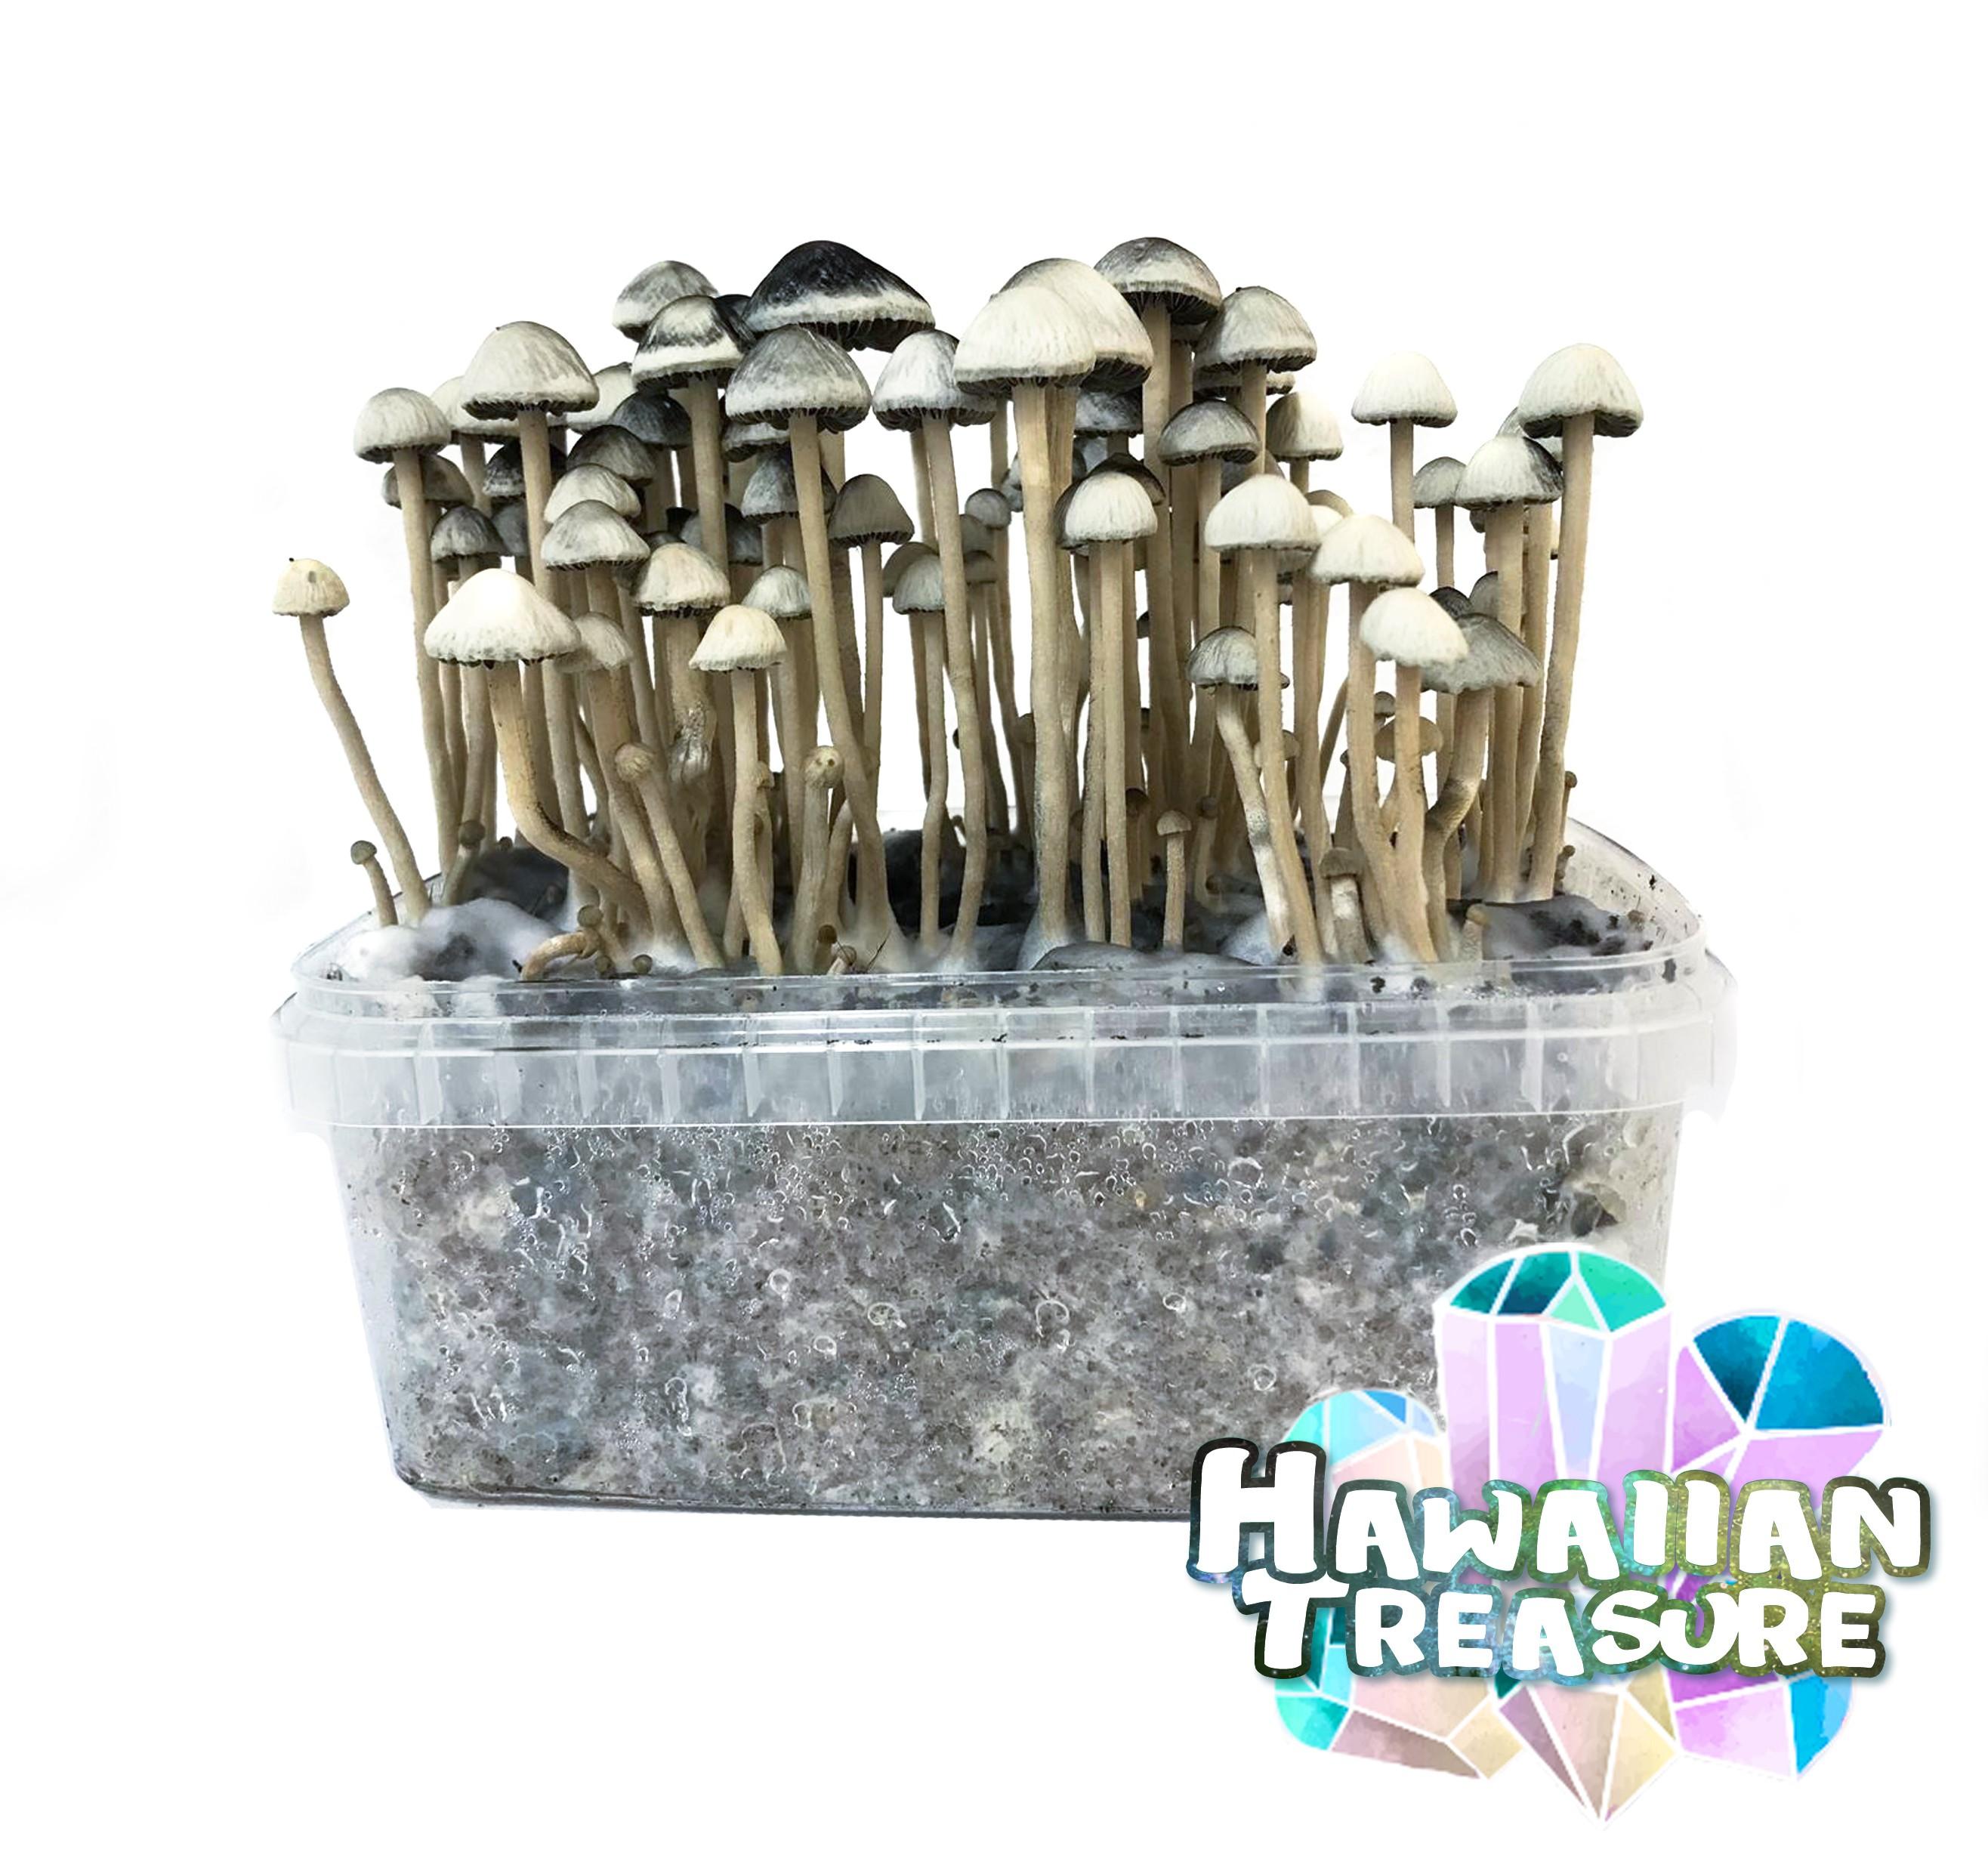 Copelandia Hawaiian Treasure Paddo Growkit 45,00 Paddo Growkits